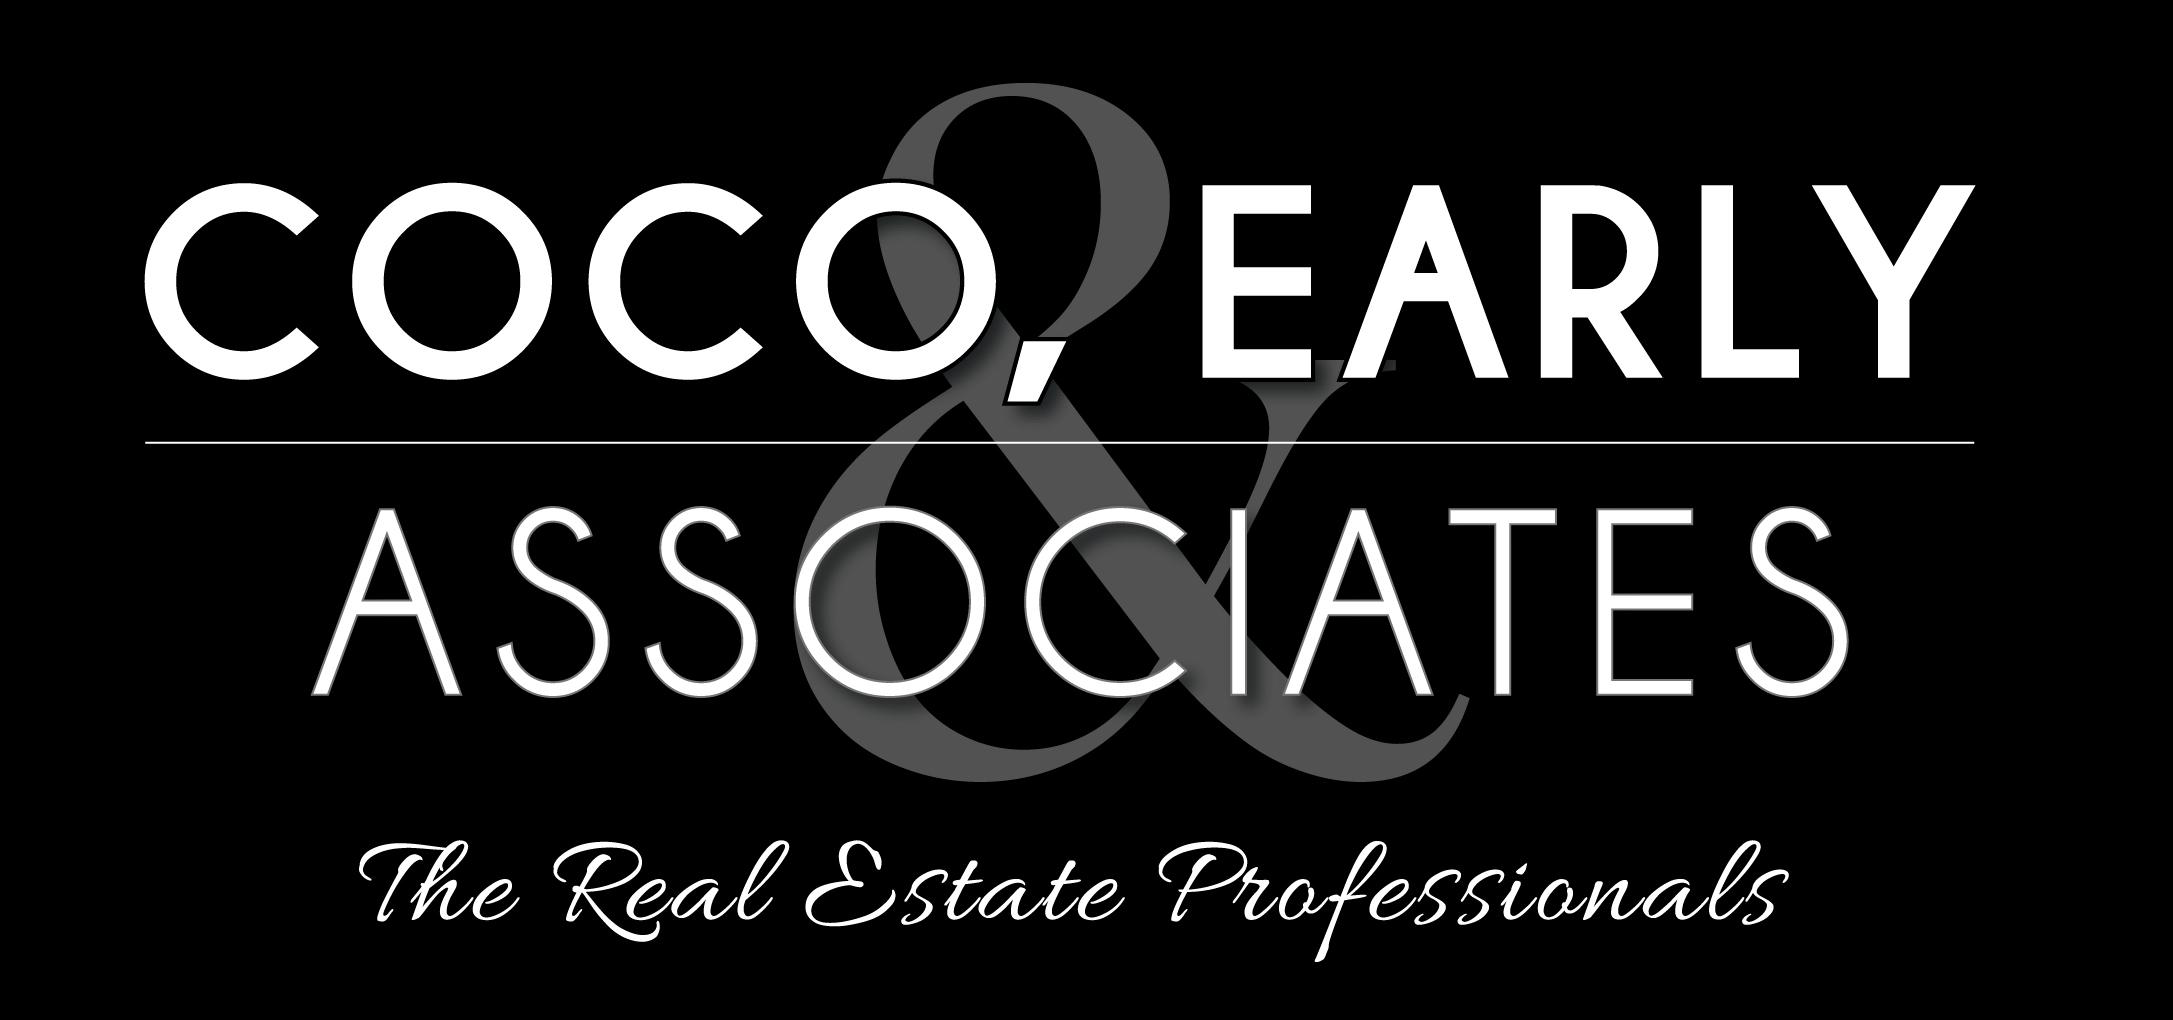 Coco, Early & Associates